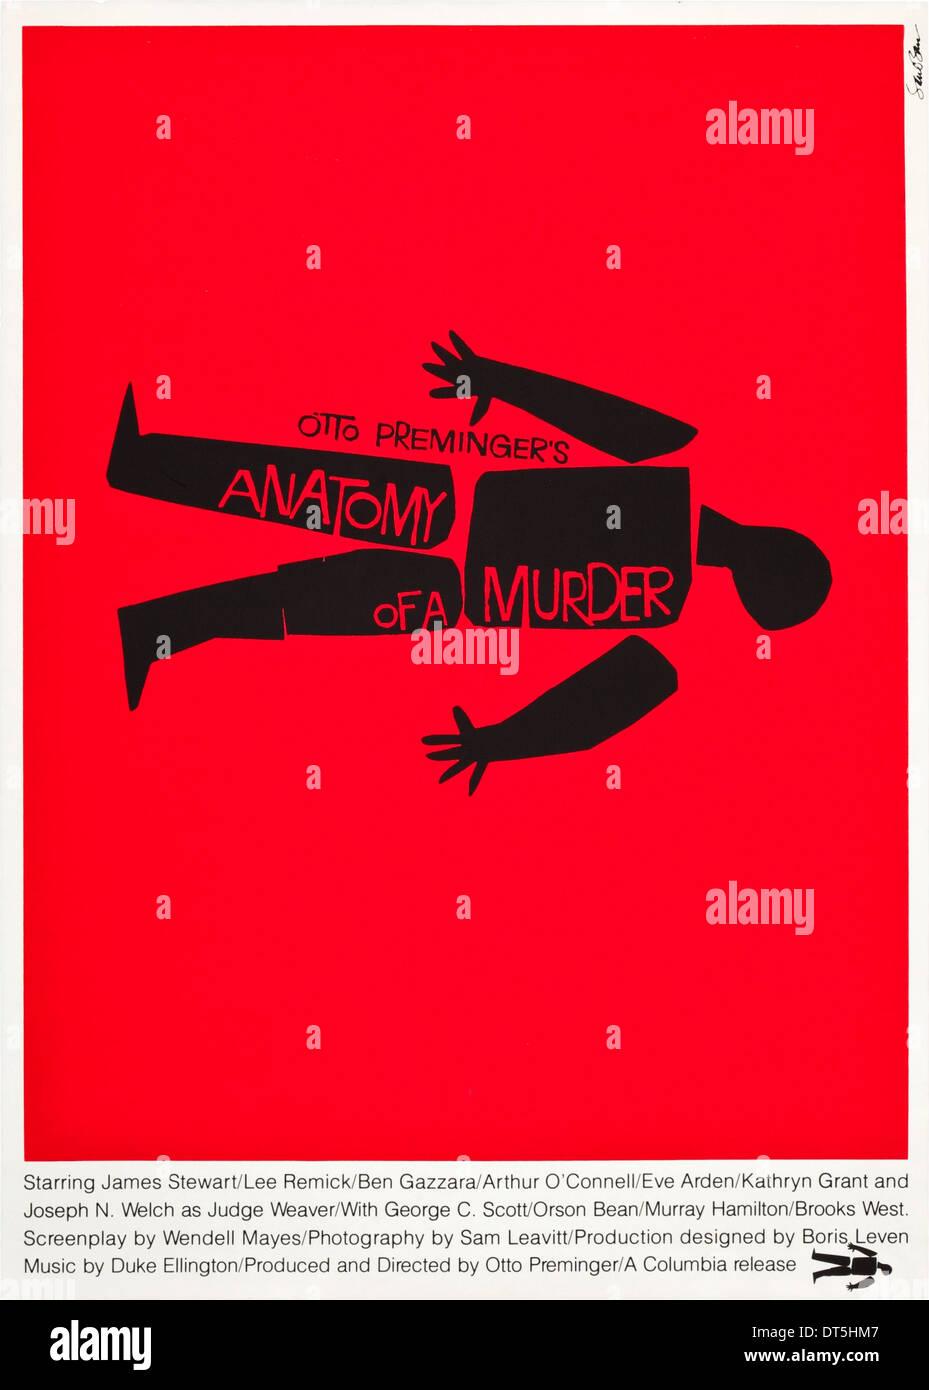 MOVIE POSTER ANATOMY OF A MURDER (1959 Stock Photo: 66506503 - Alamy